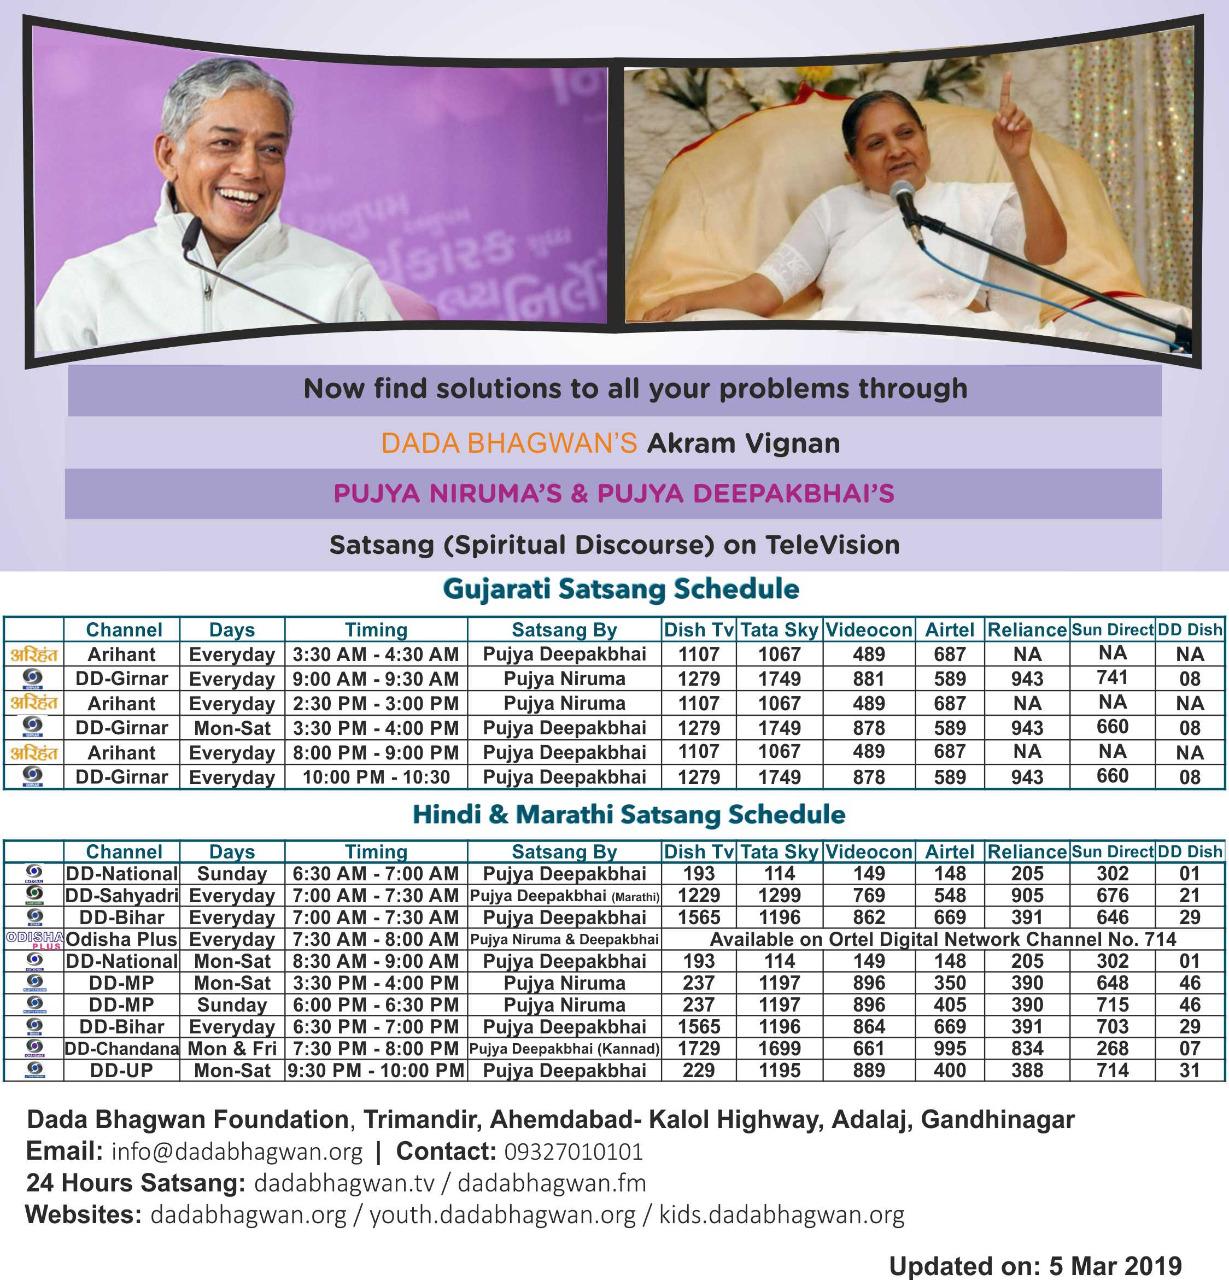 Dada Bhagwan Satsang Videos: UPDATED TV SCHEDULE INDIA | SATSANG ON